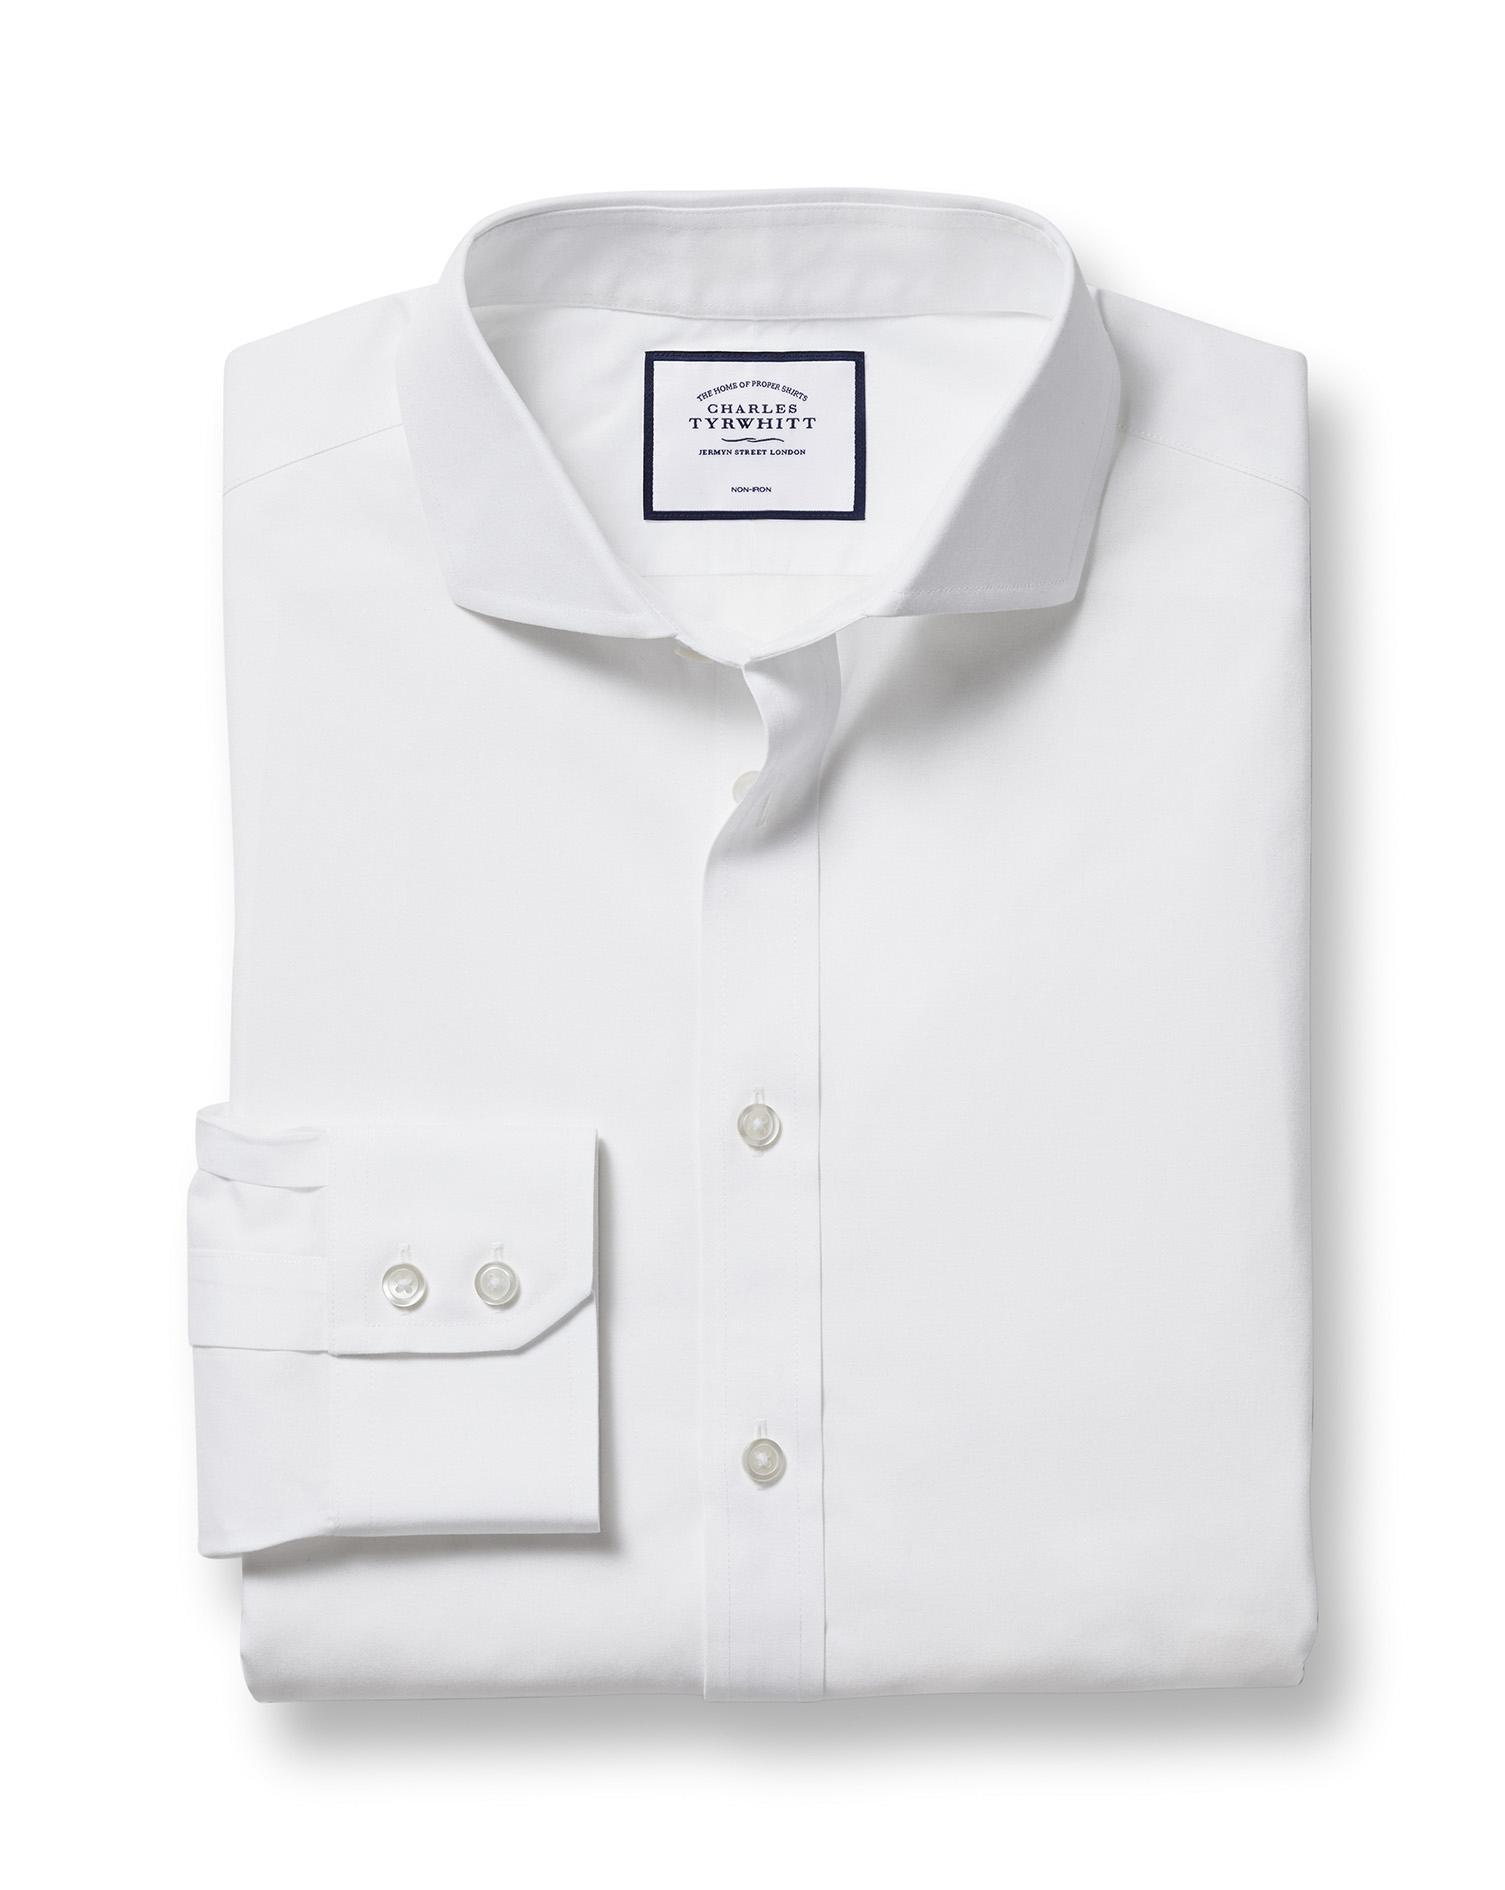 Cotton Slim Fit White Non-Iron Poplin Cutaway Shirt